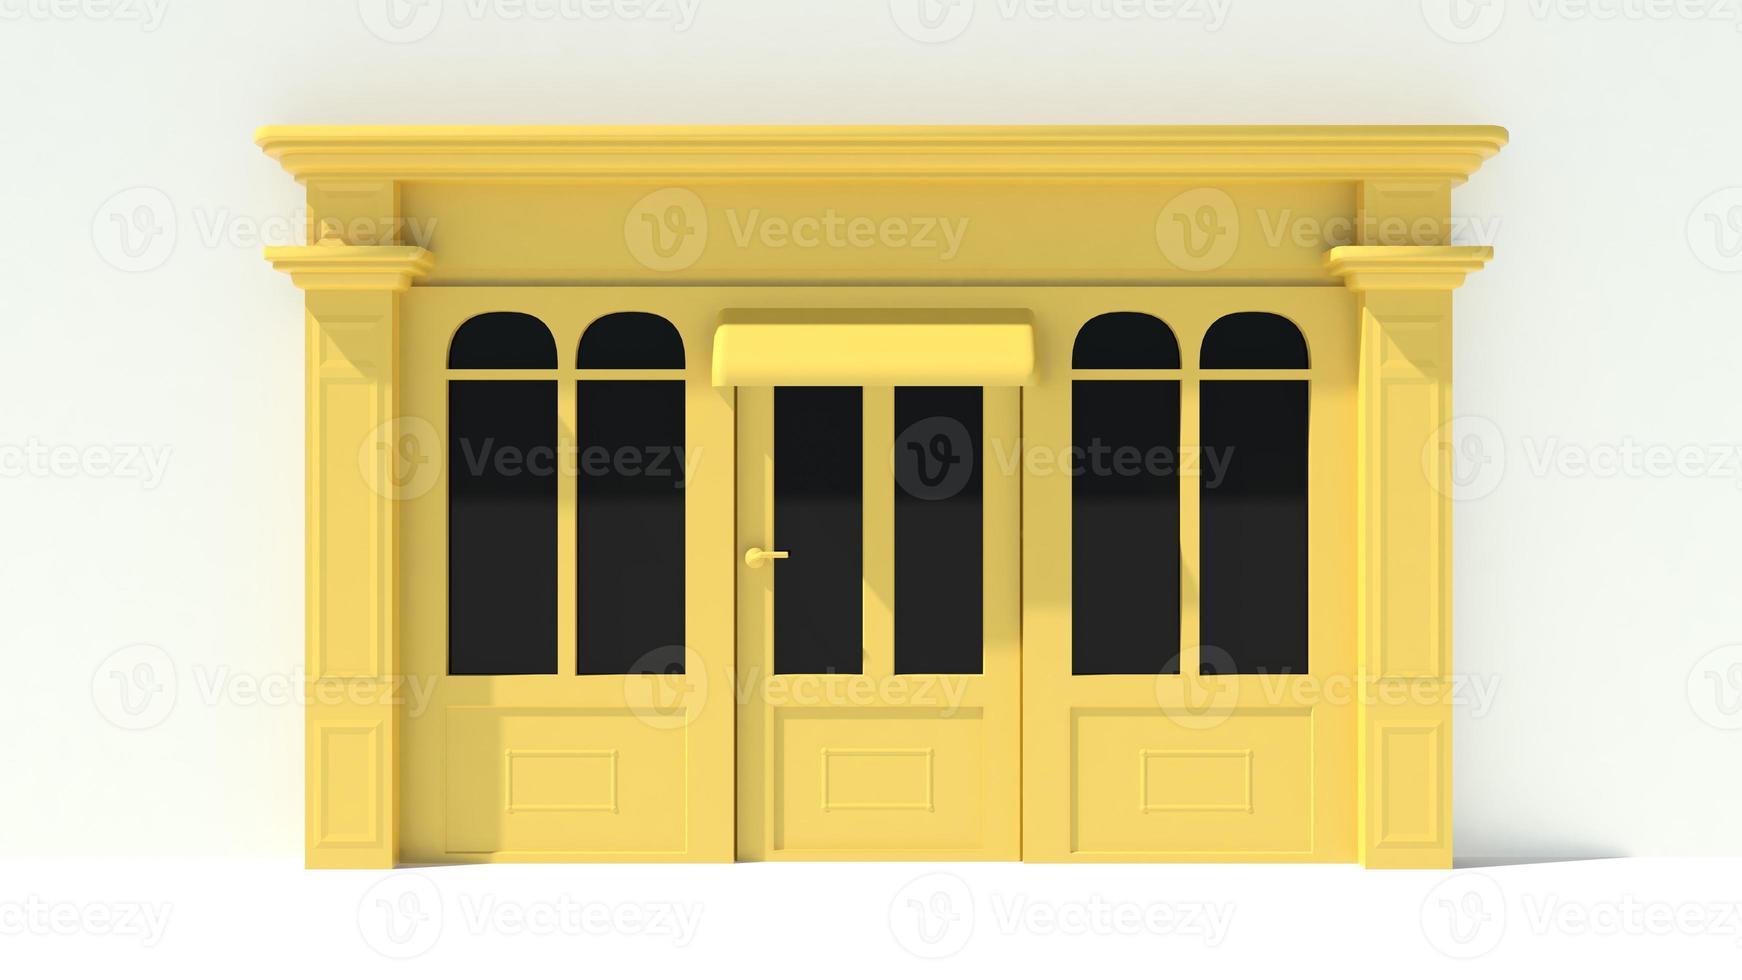 zonnige winkelpui met grote ramen met witte en gele winkelgevel foto